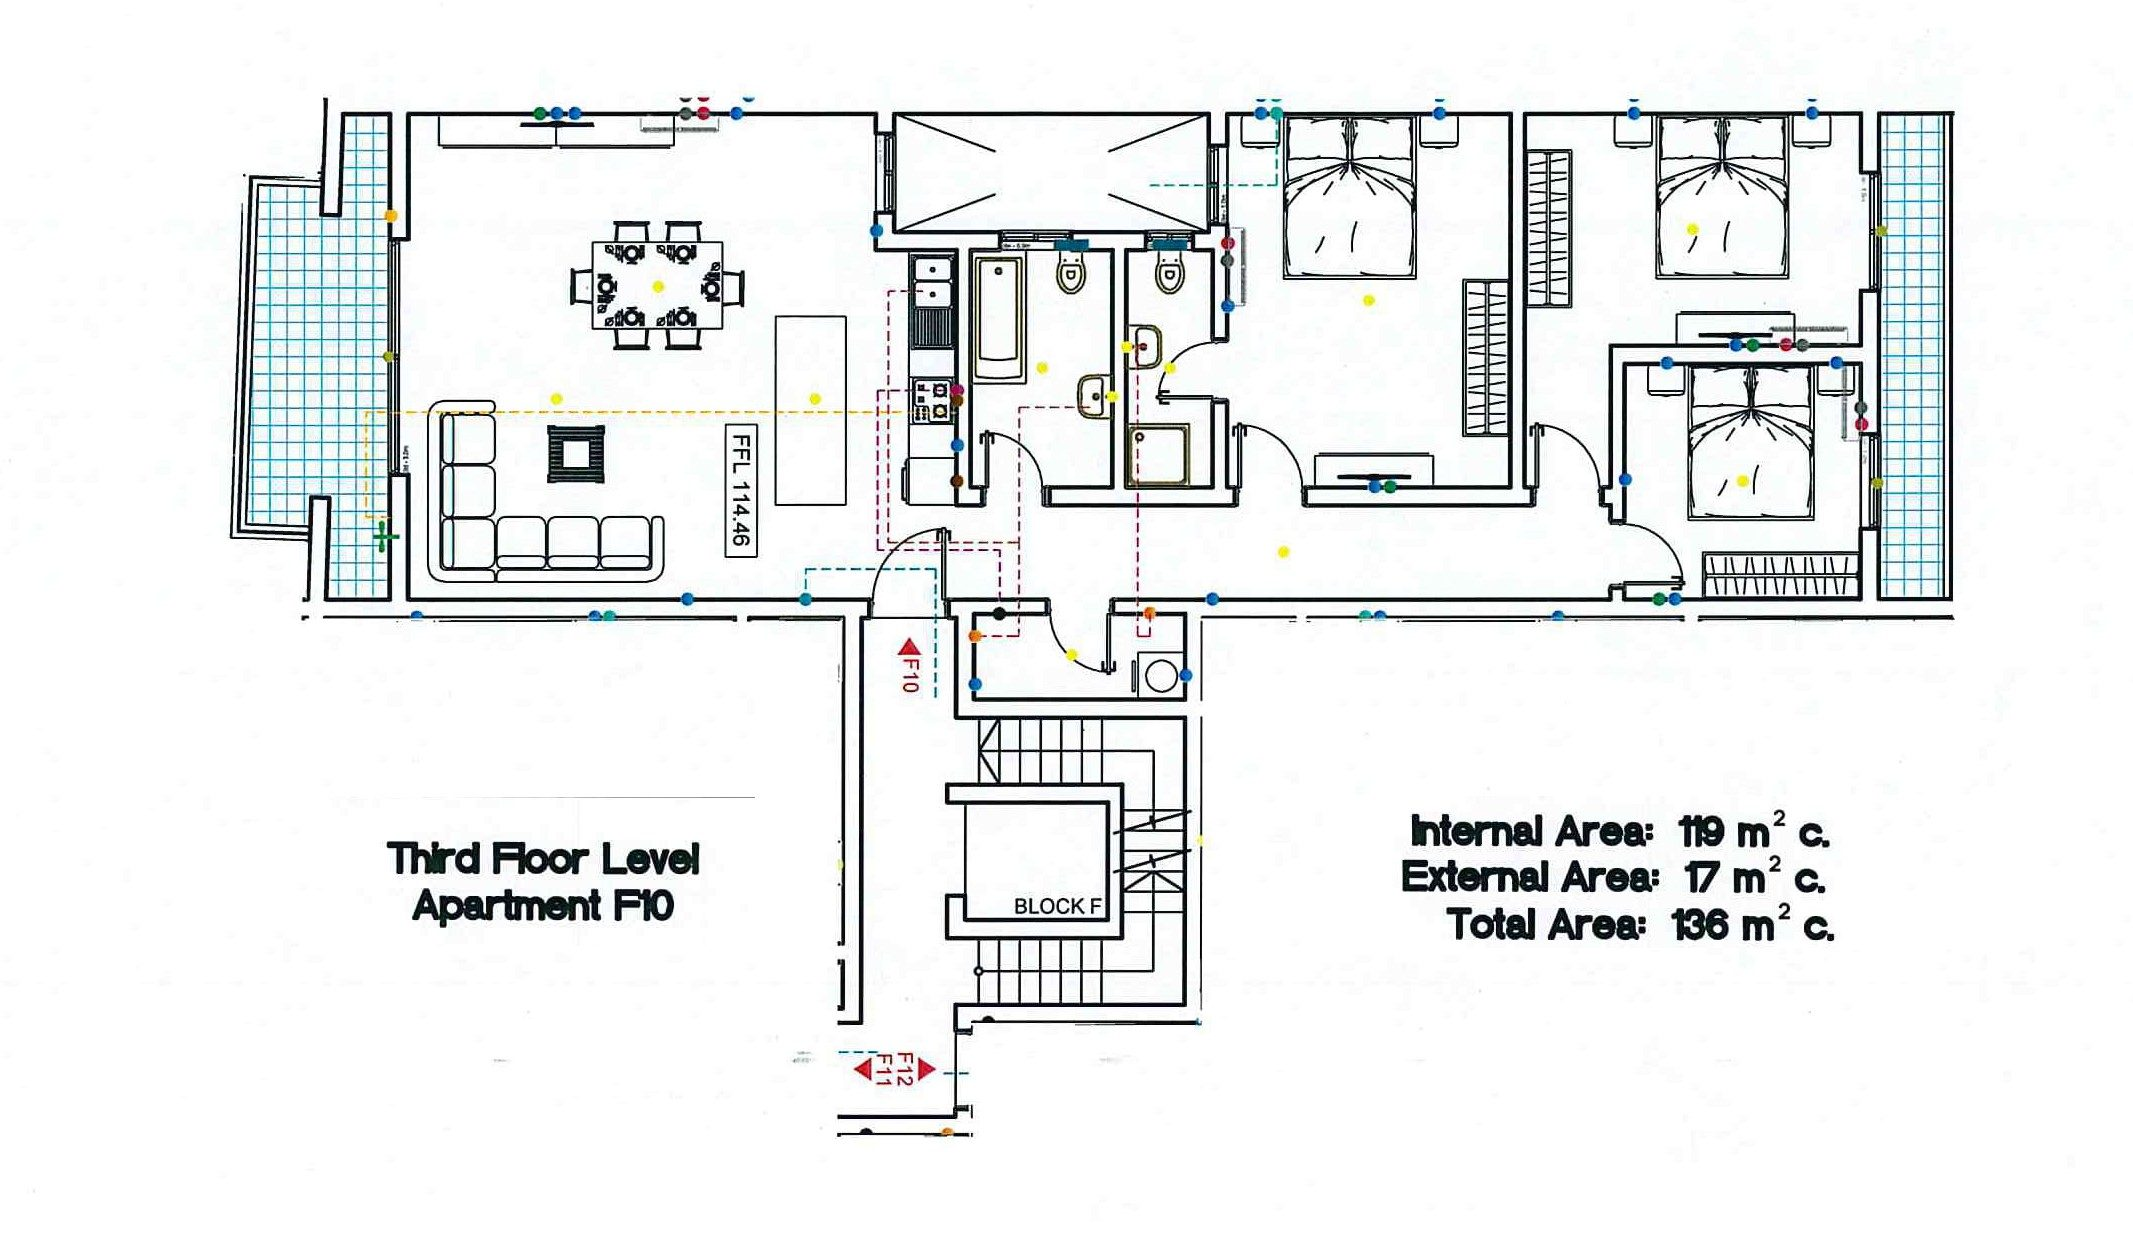 Block F - Third Floor F10